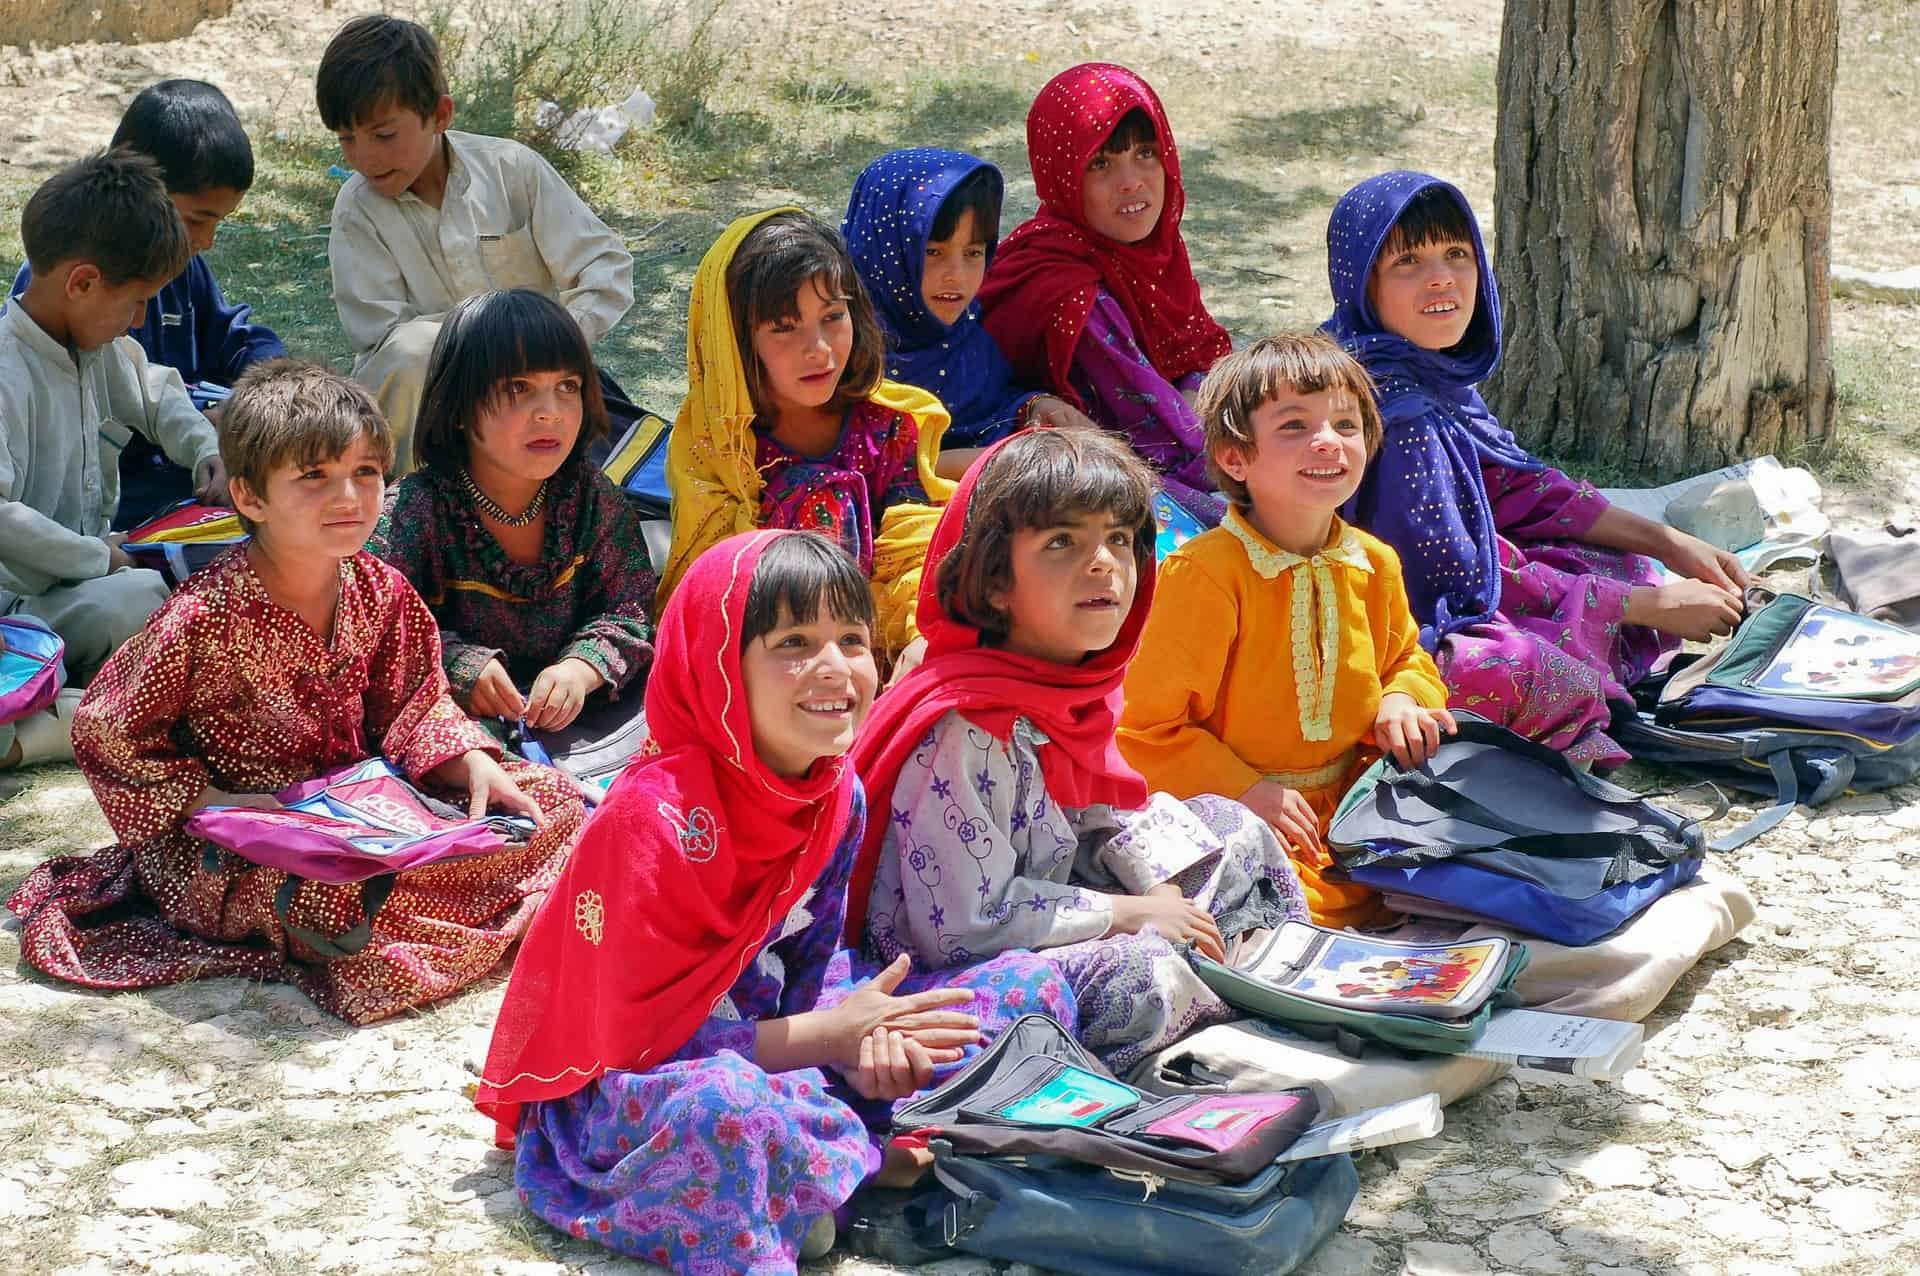 Islam Kinder